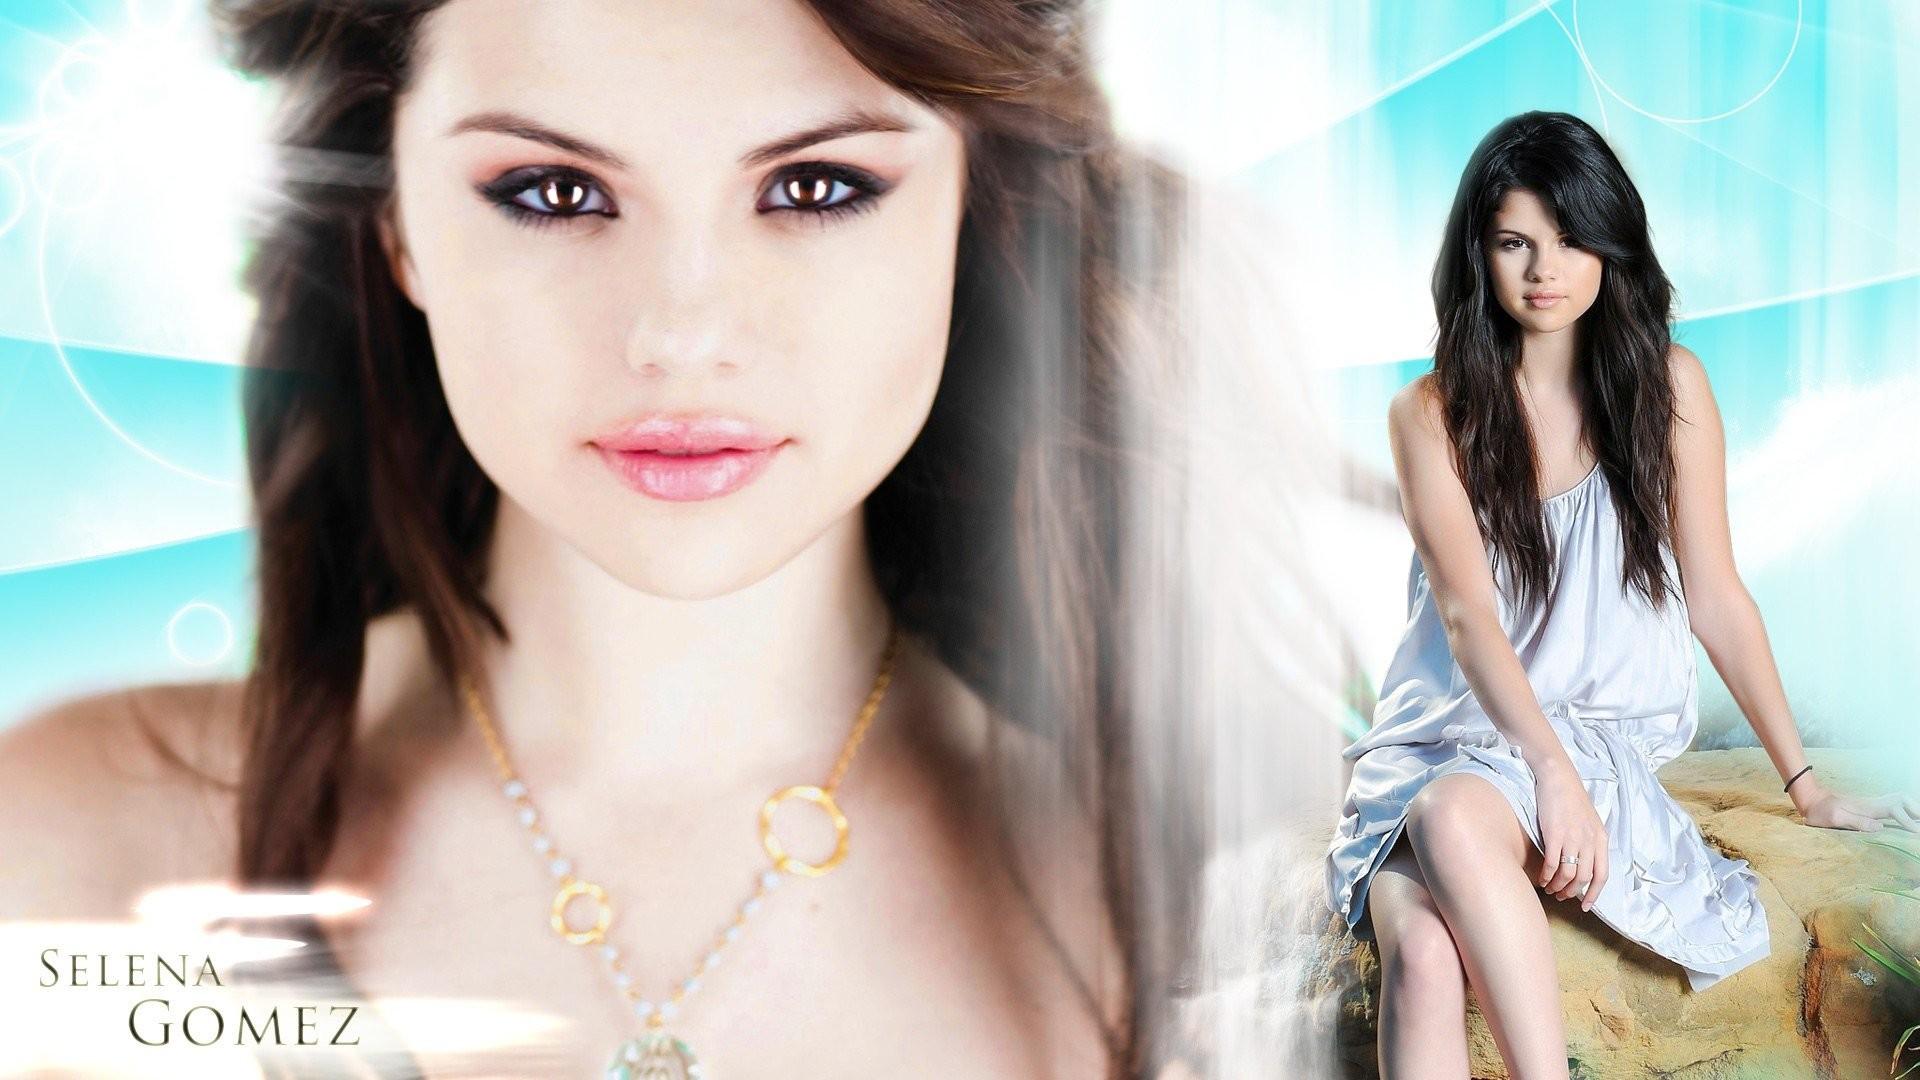 1920x1080 Selena Gomez Desktop Wallpaper 6061